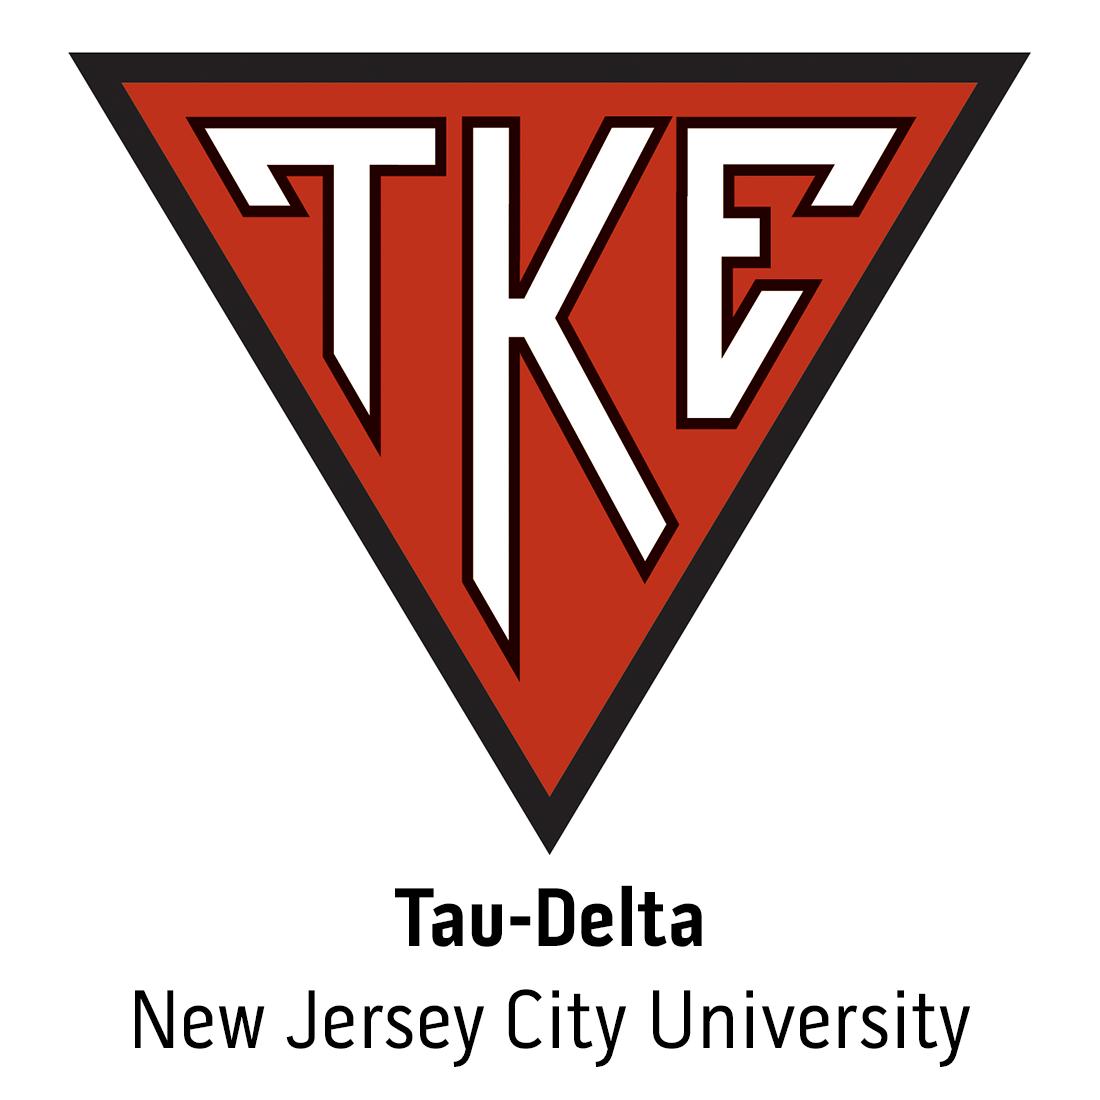 Tau-Delta C at New Jersey City University